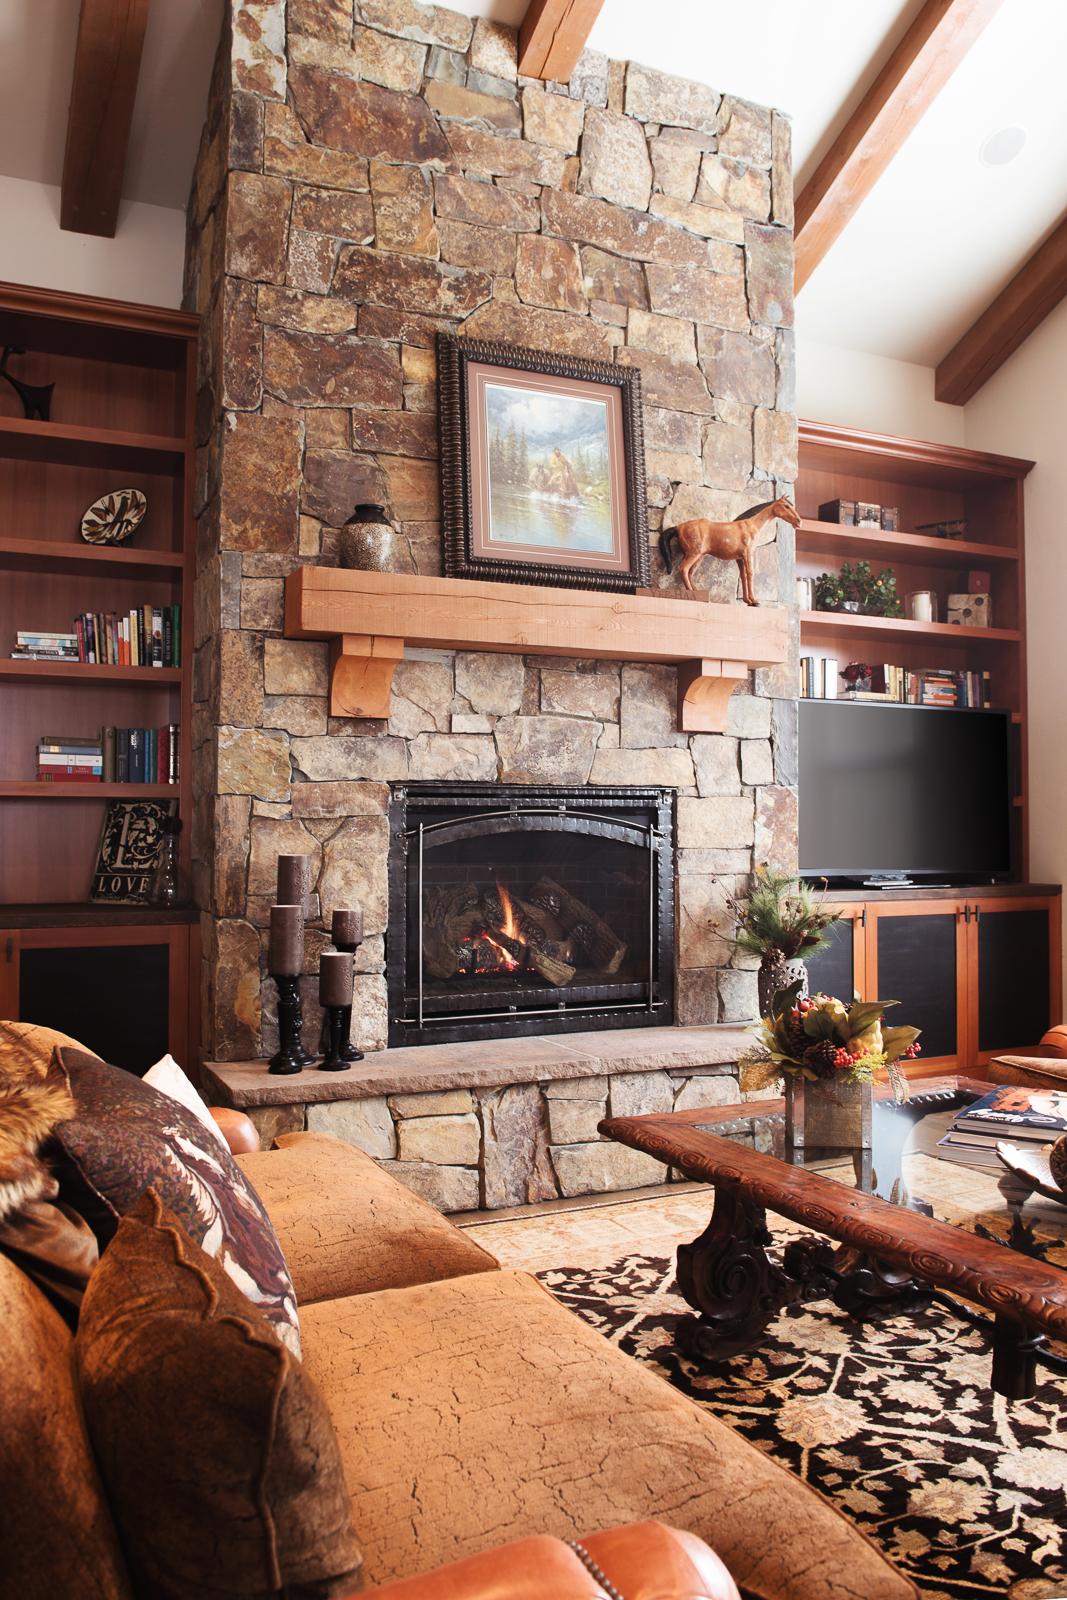 Woodworks-West-Bozeman-Montana-Builder-Cabinetry-Remodel-New-Construction-3471.jpg